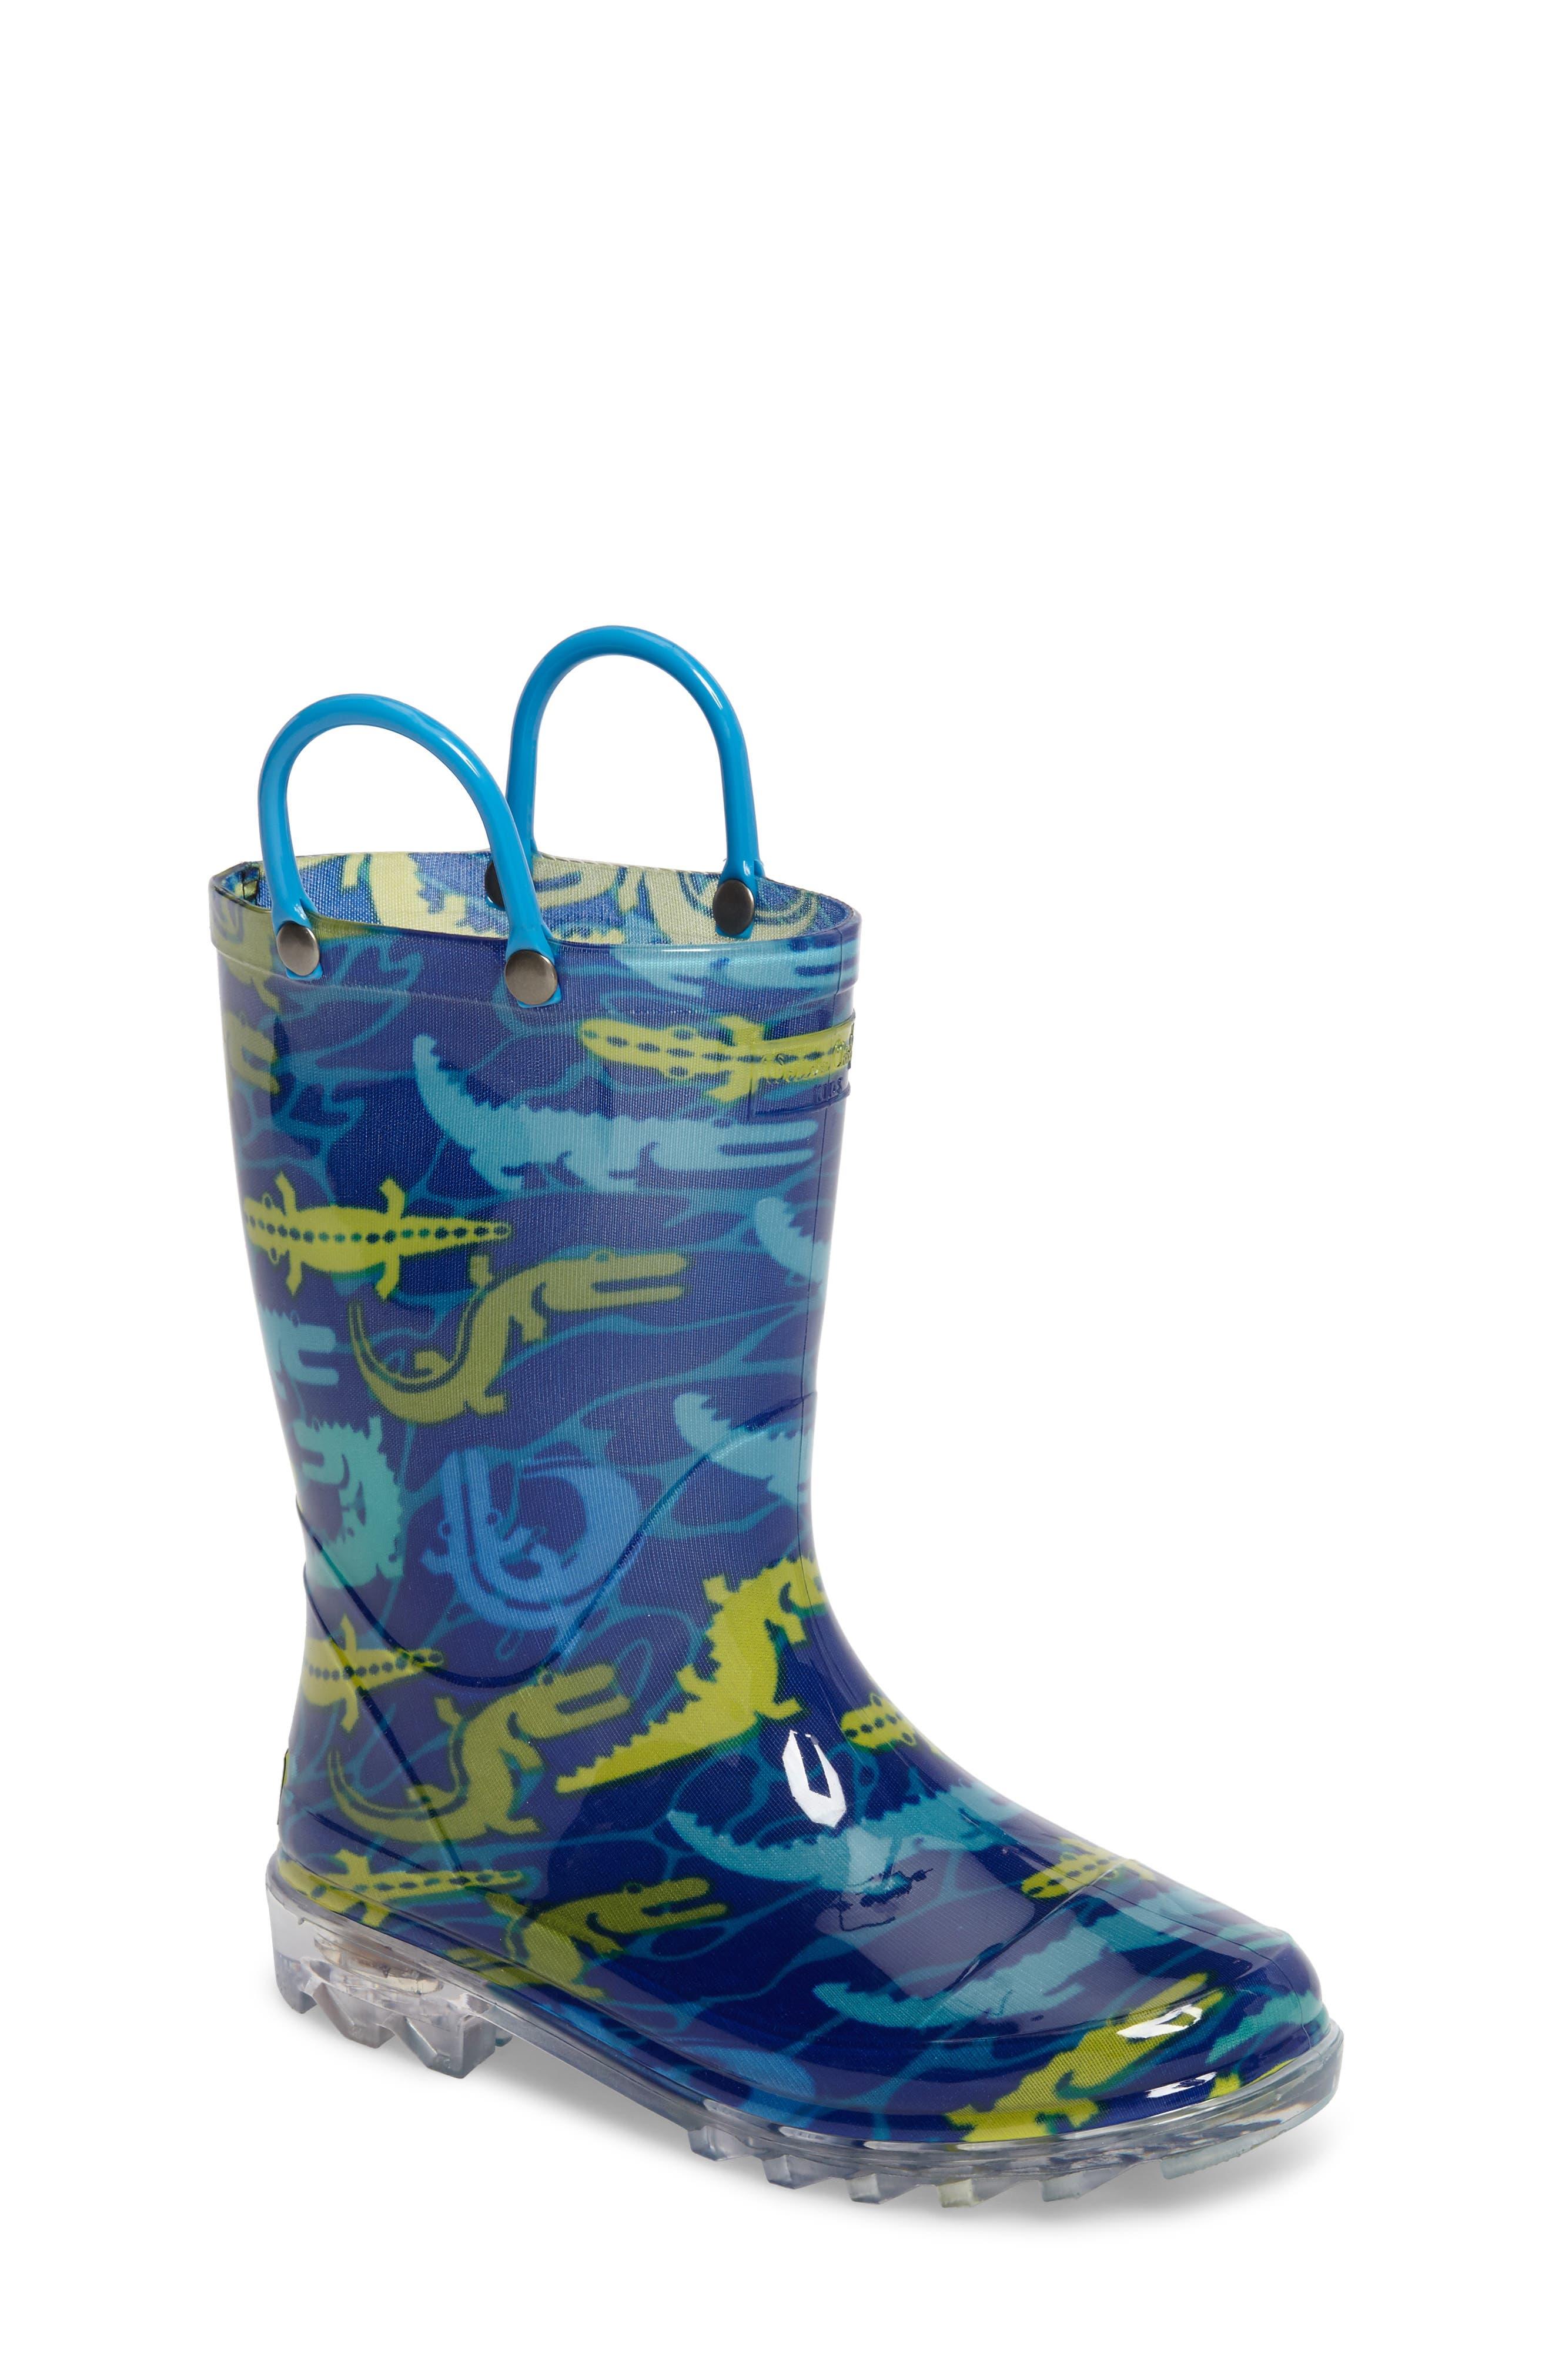 Alternate Image 1 Selected - Western Chief Gators Galore Light-Up Rain Boot (Toddler & Little Kid)